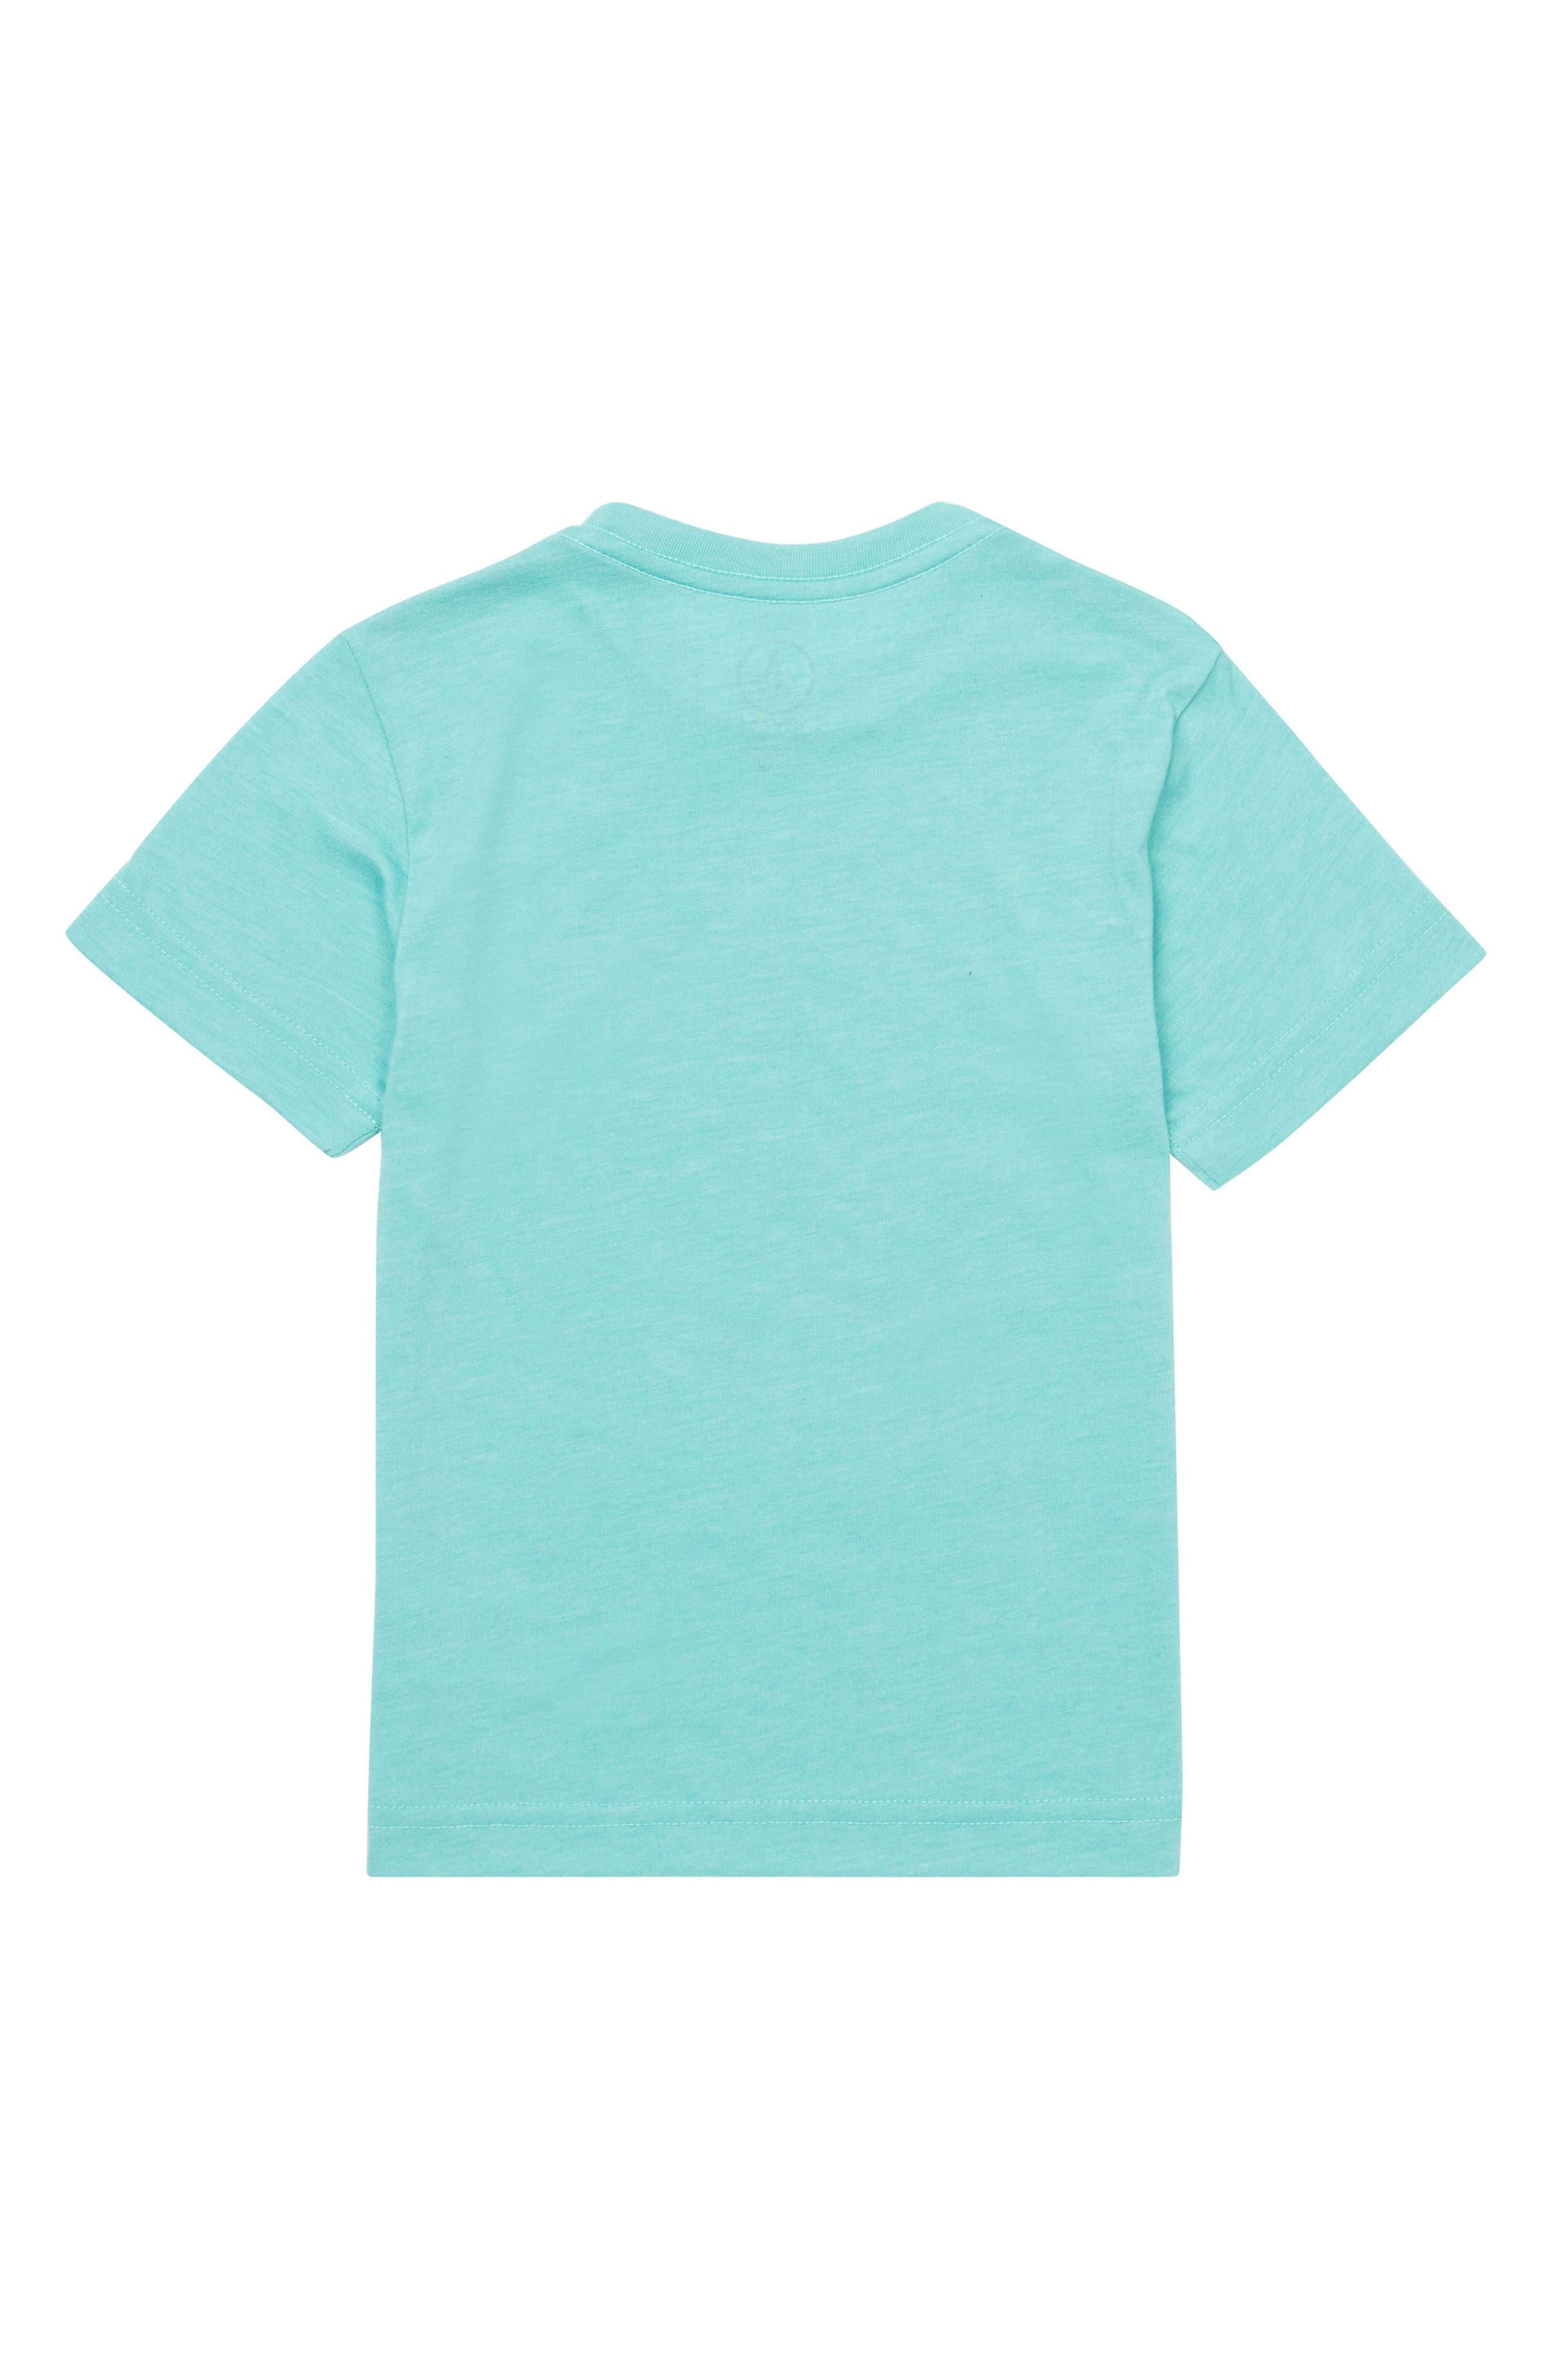 Statiq Graphic T-Shirt,                             Alternate thumbnail 2, color,                             Turquoise